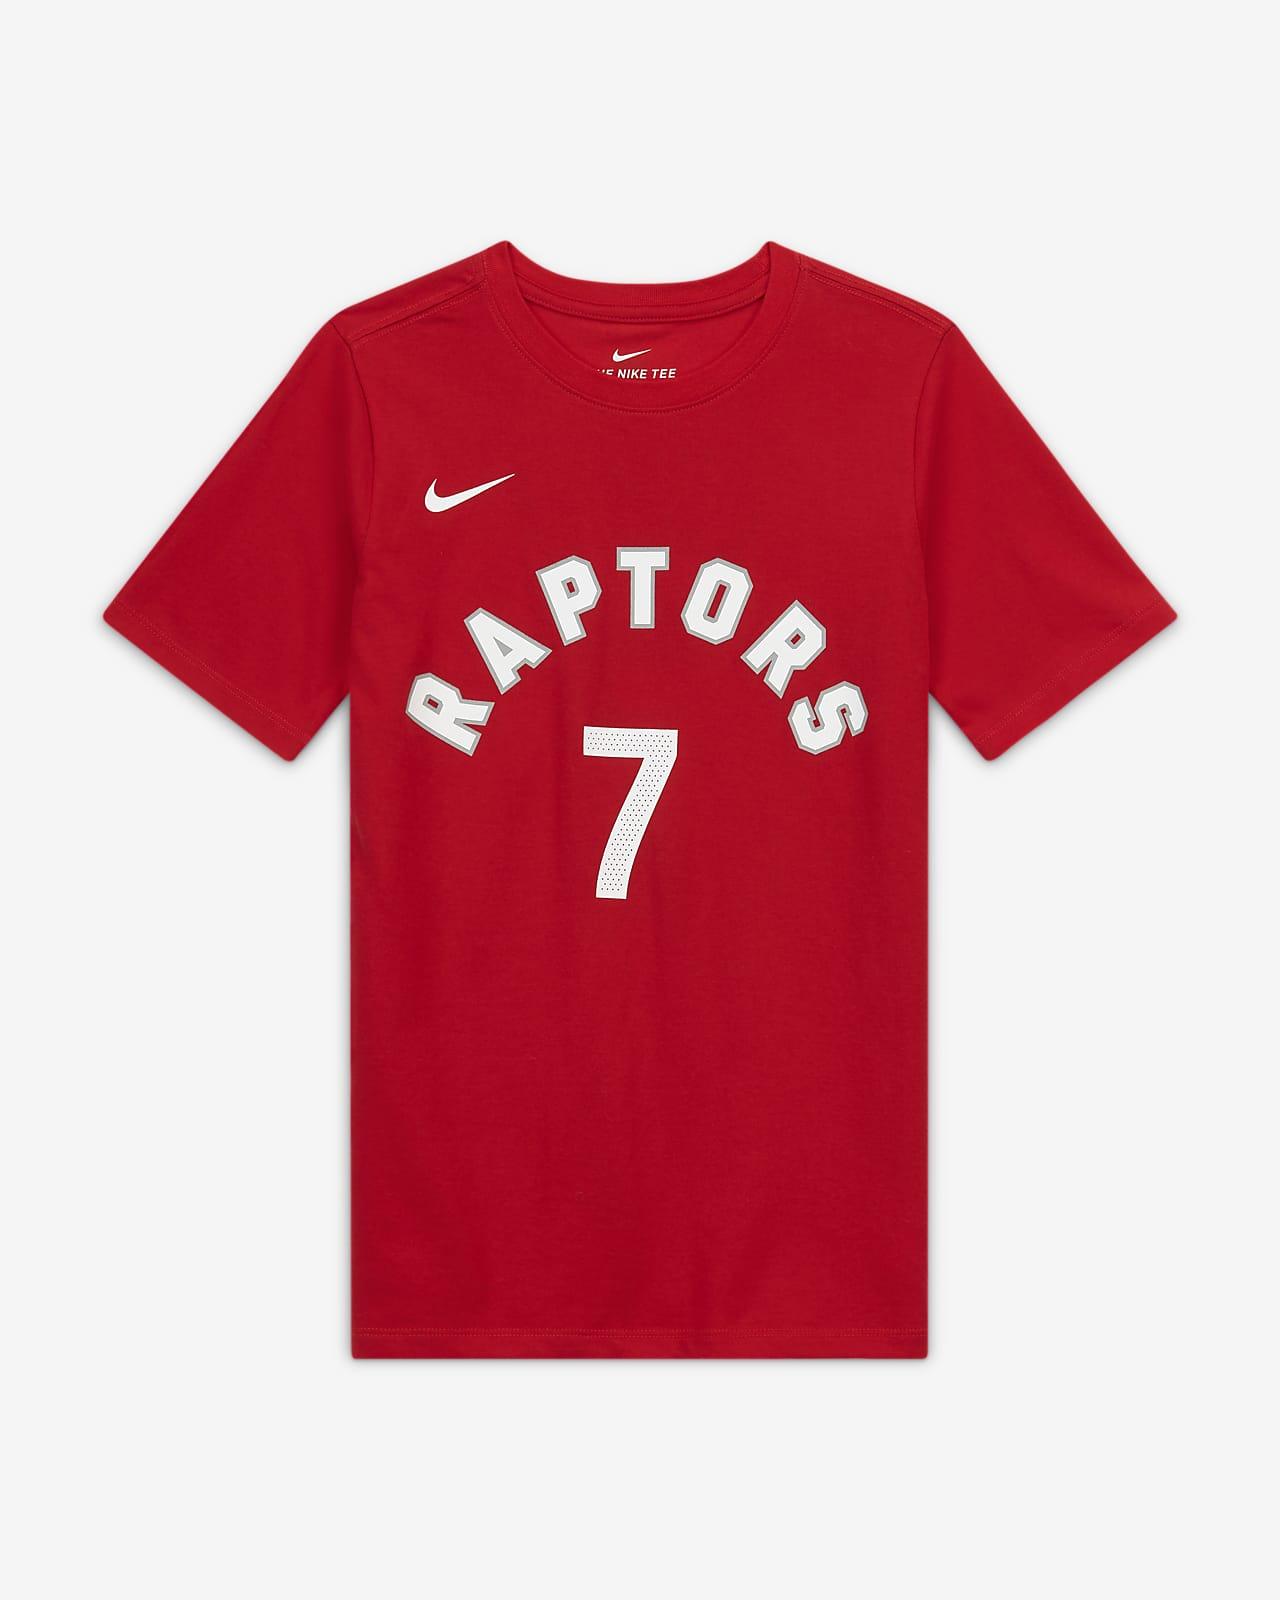 Kyle Lowry Raptors Nike Dri-FIT NBA-s póló nagyobb gyerekeknek